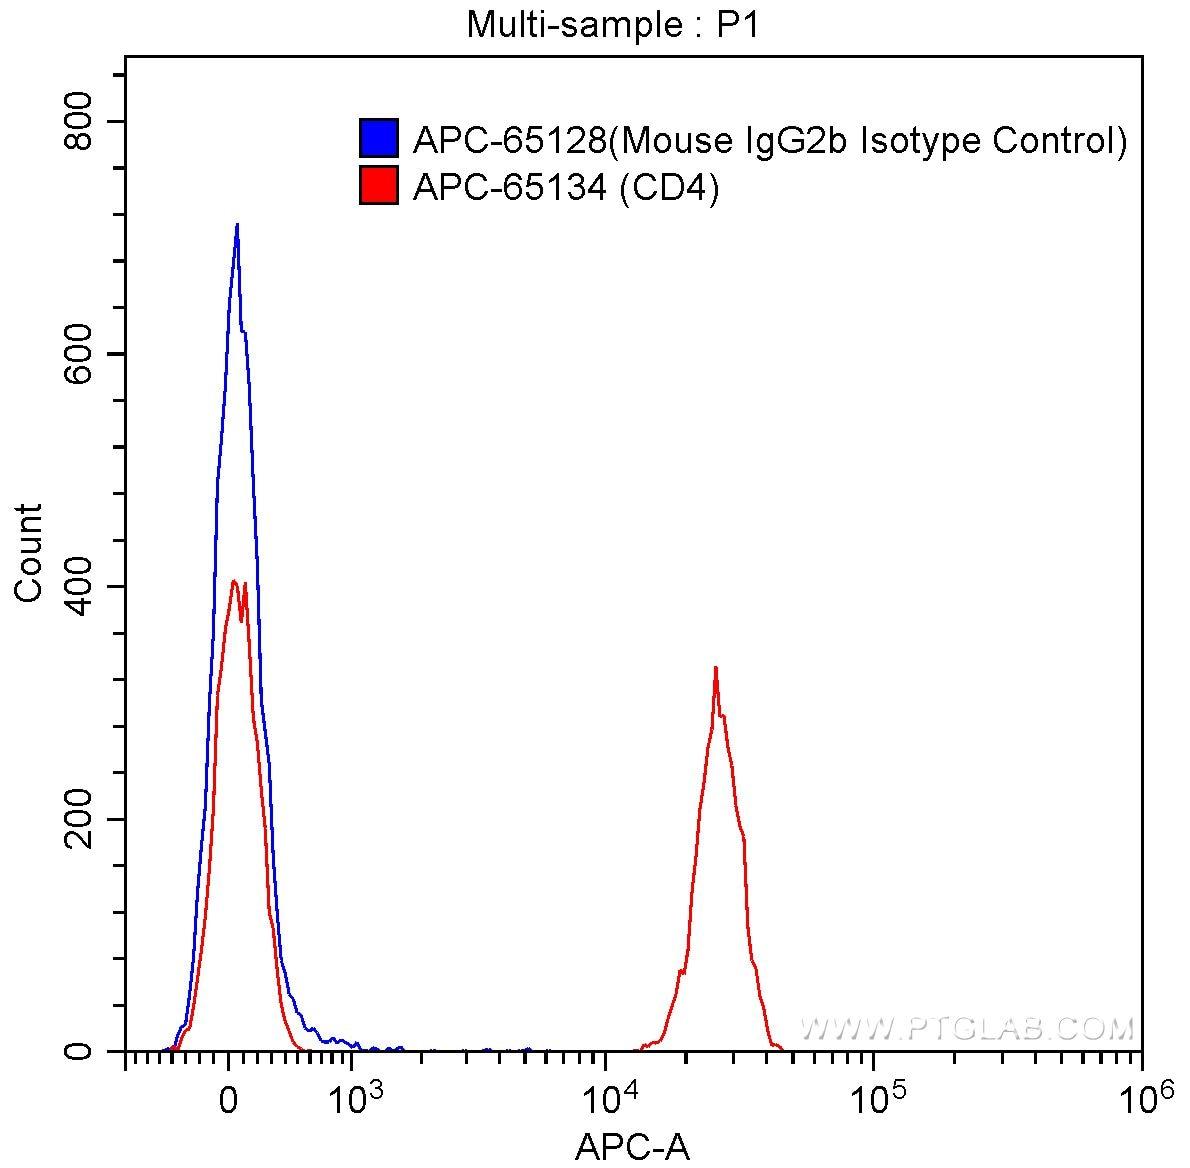 FC experiment of human peripheral blood lymphocytes using APC-65134